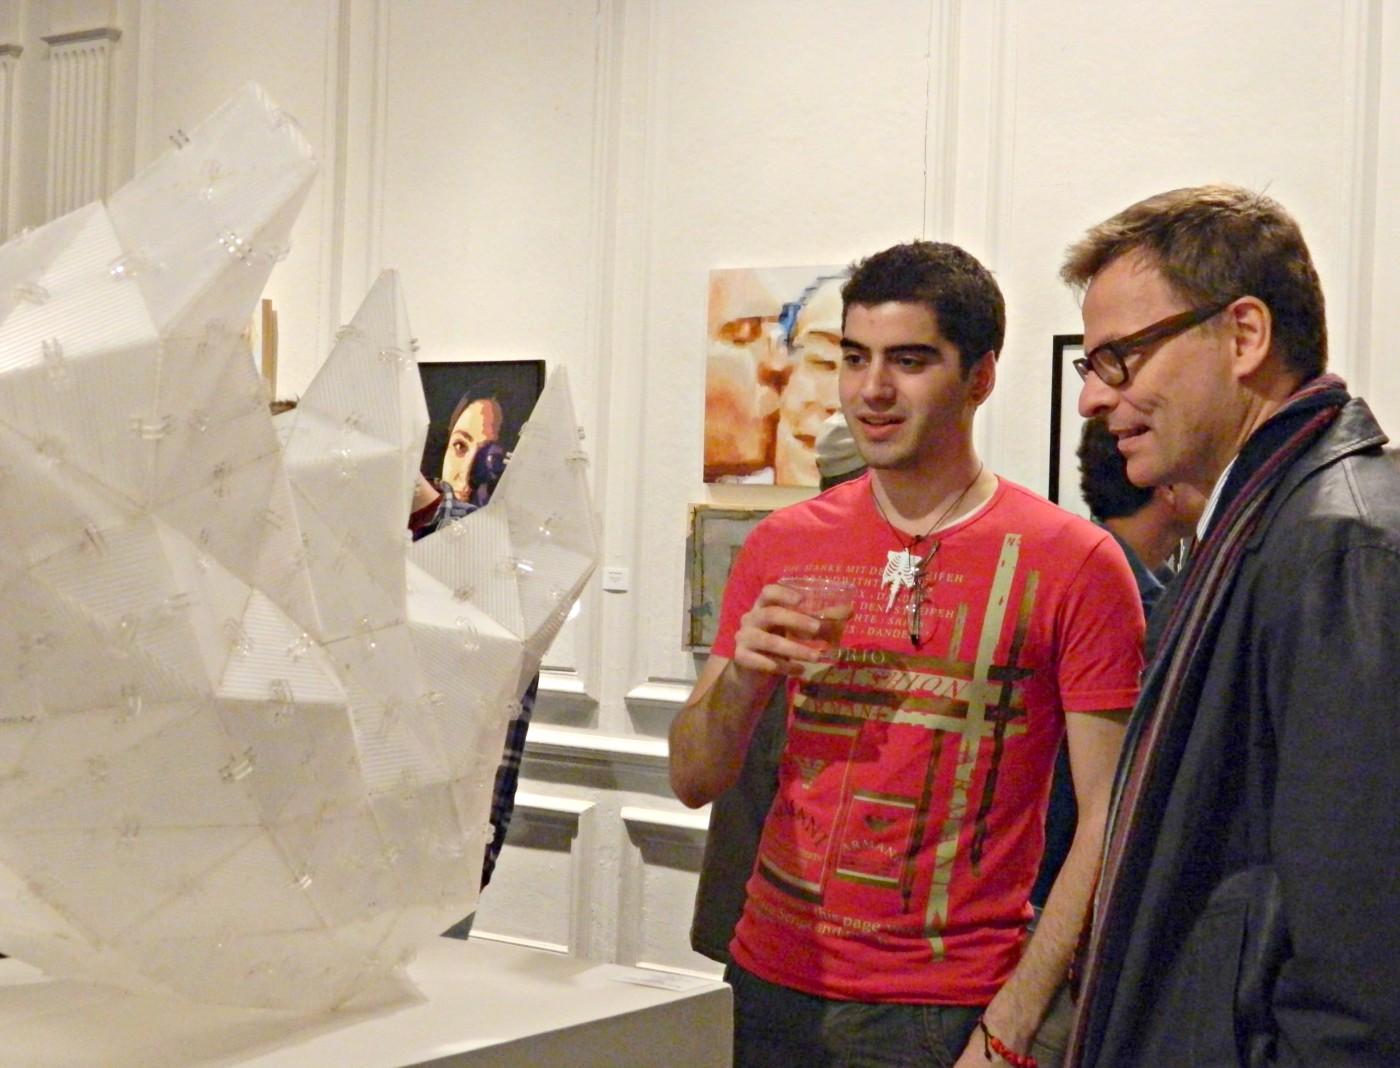 Matthias and Paul rhino